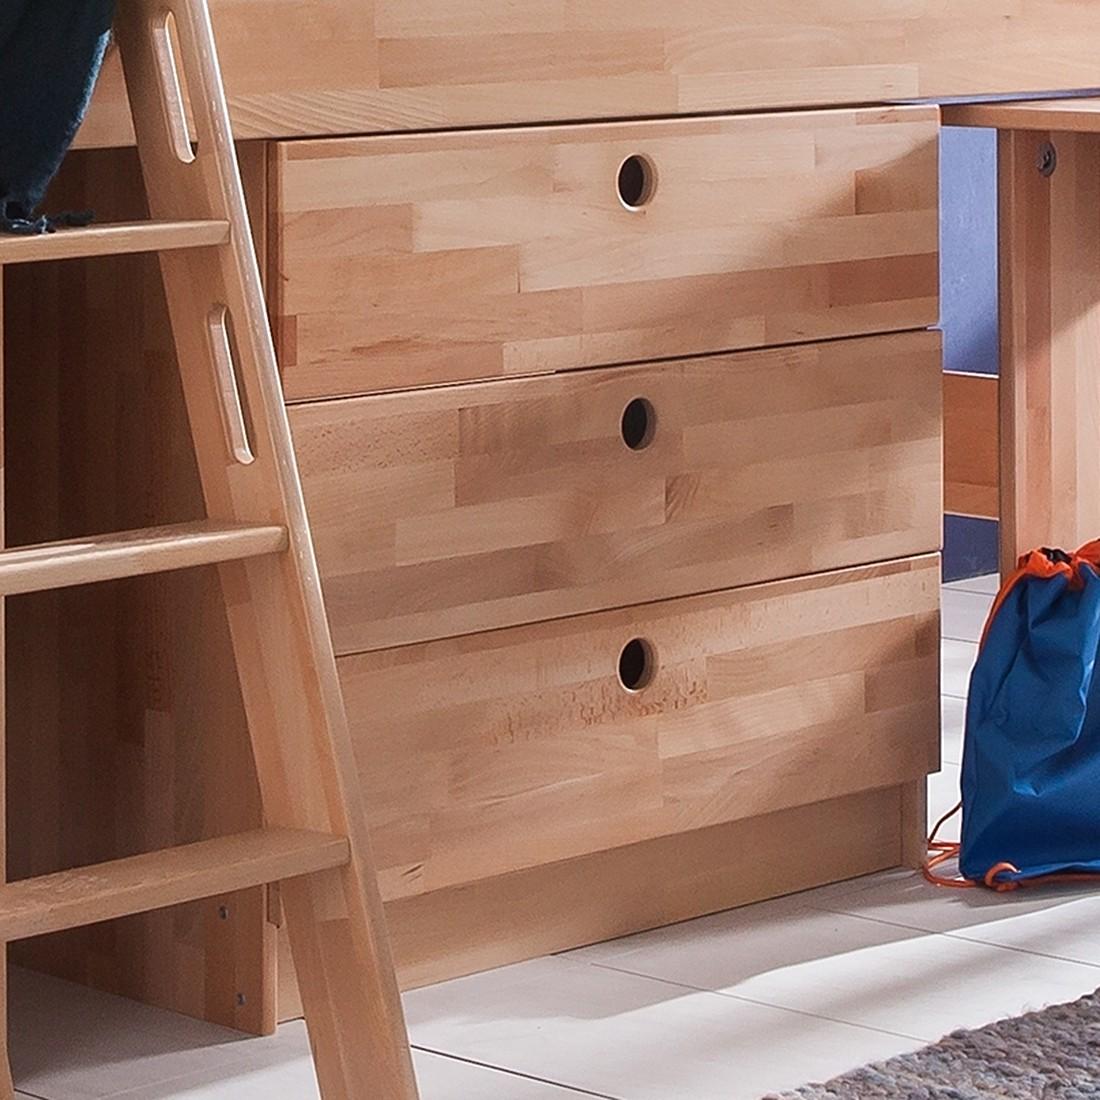 kommode buche massiv t ren g nstig kaufen. Black Bedroom Furniture Sets. Home Design Ideas